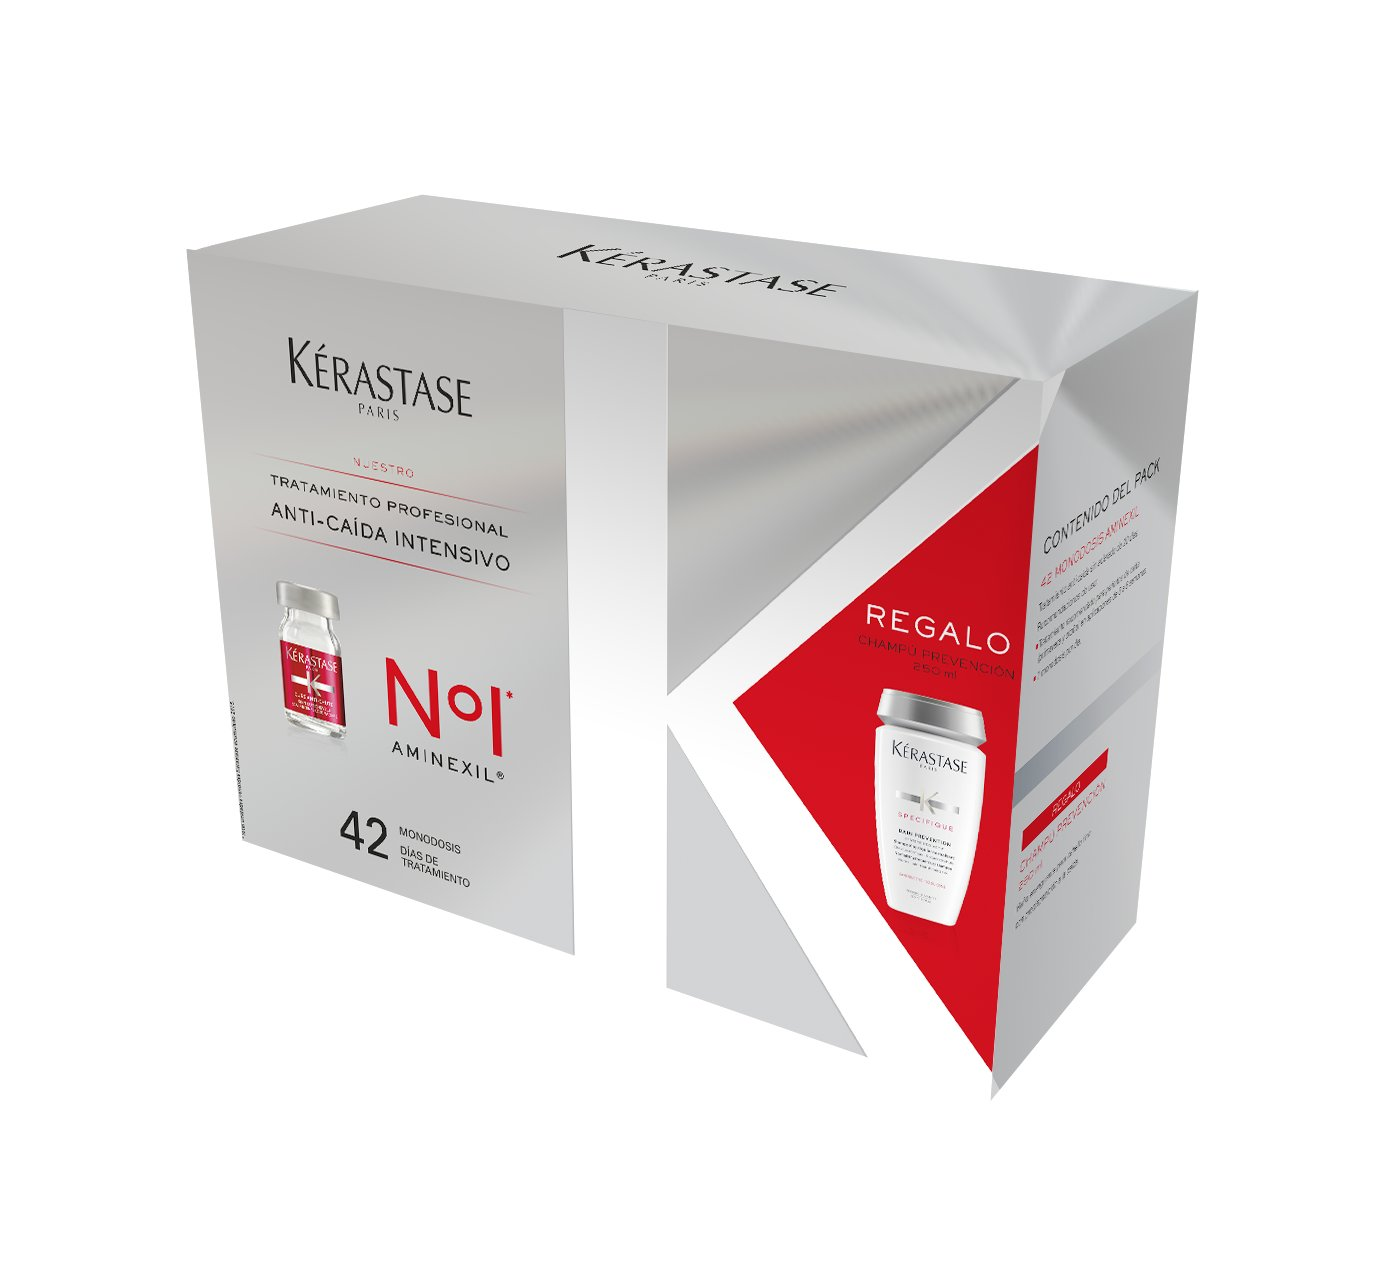 Pack tratamiento anti-caída aminexil tratamiento profesional de kerast. Kerastase 905-15012